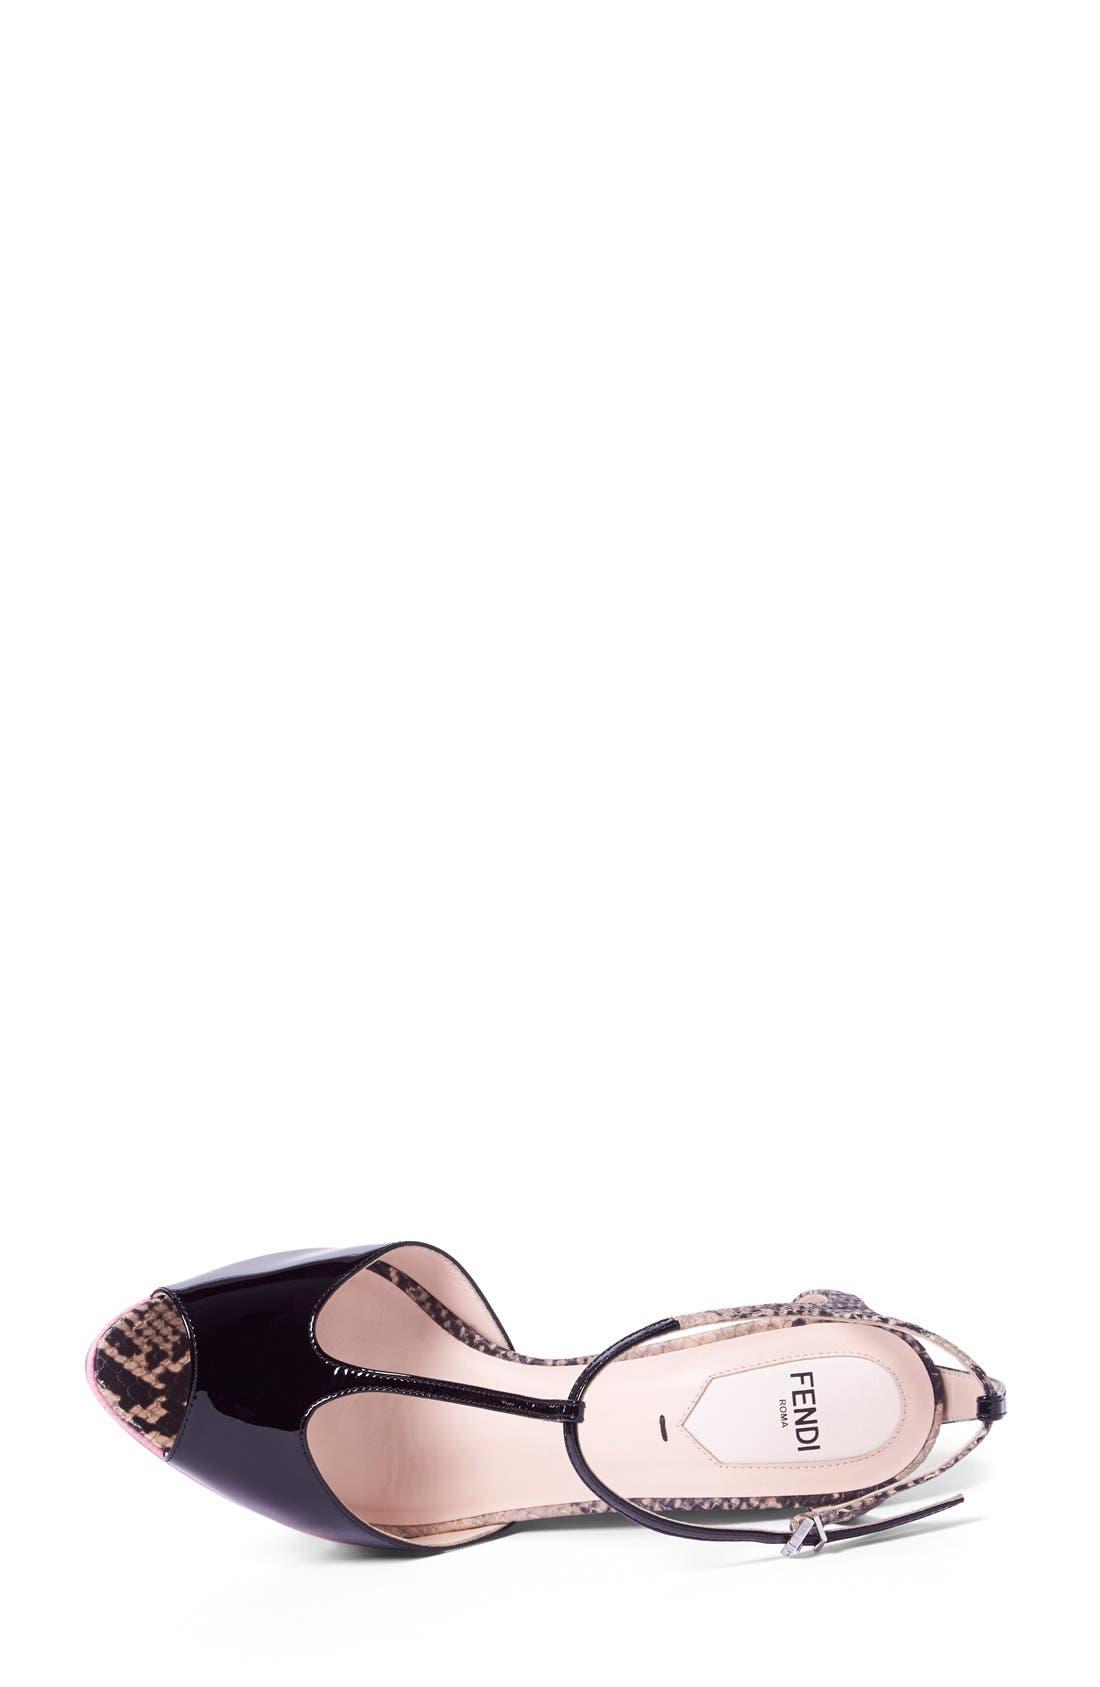 'Elodie' T-Strap Wedge Sandal,                             Alternate thumbnail 3, color,                             Black/ Pink Patent